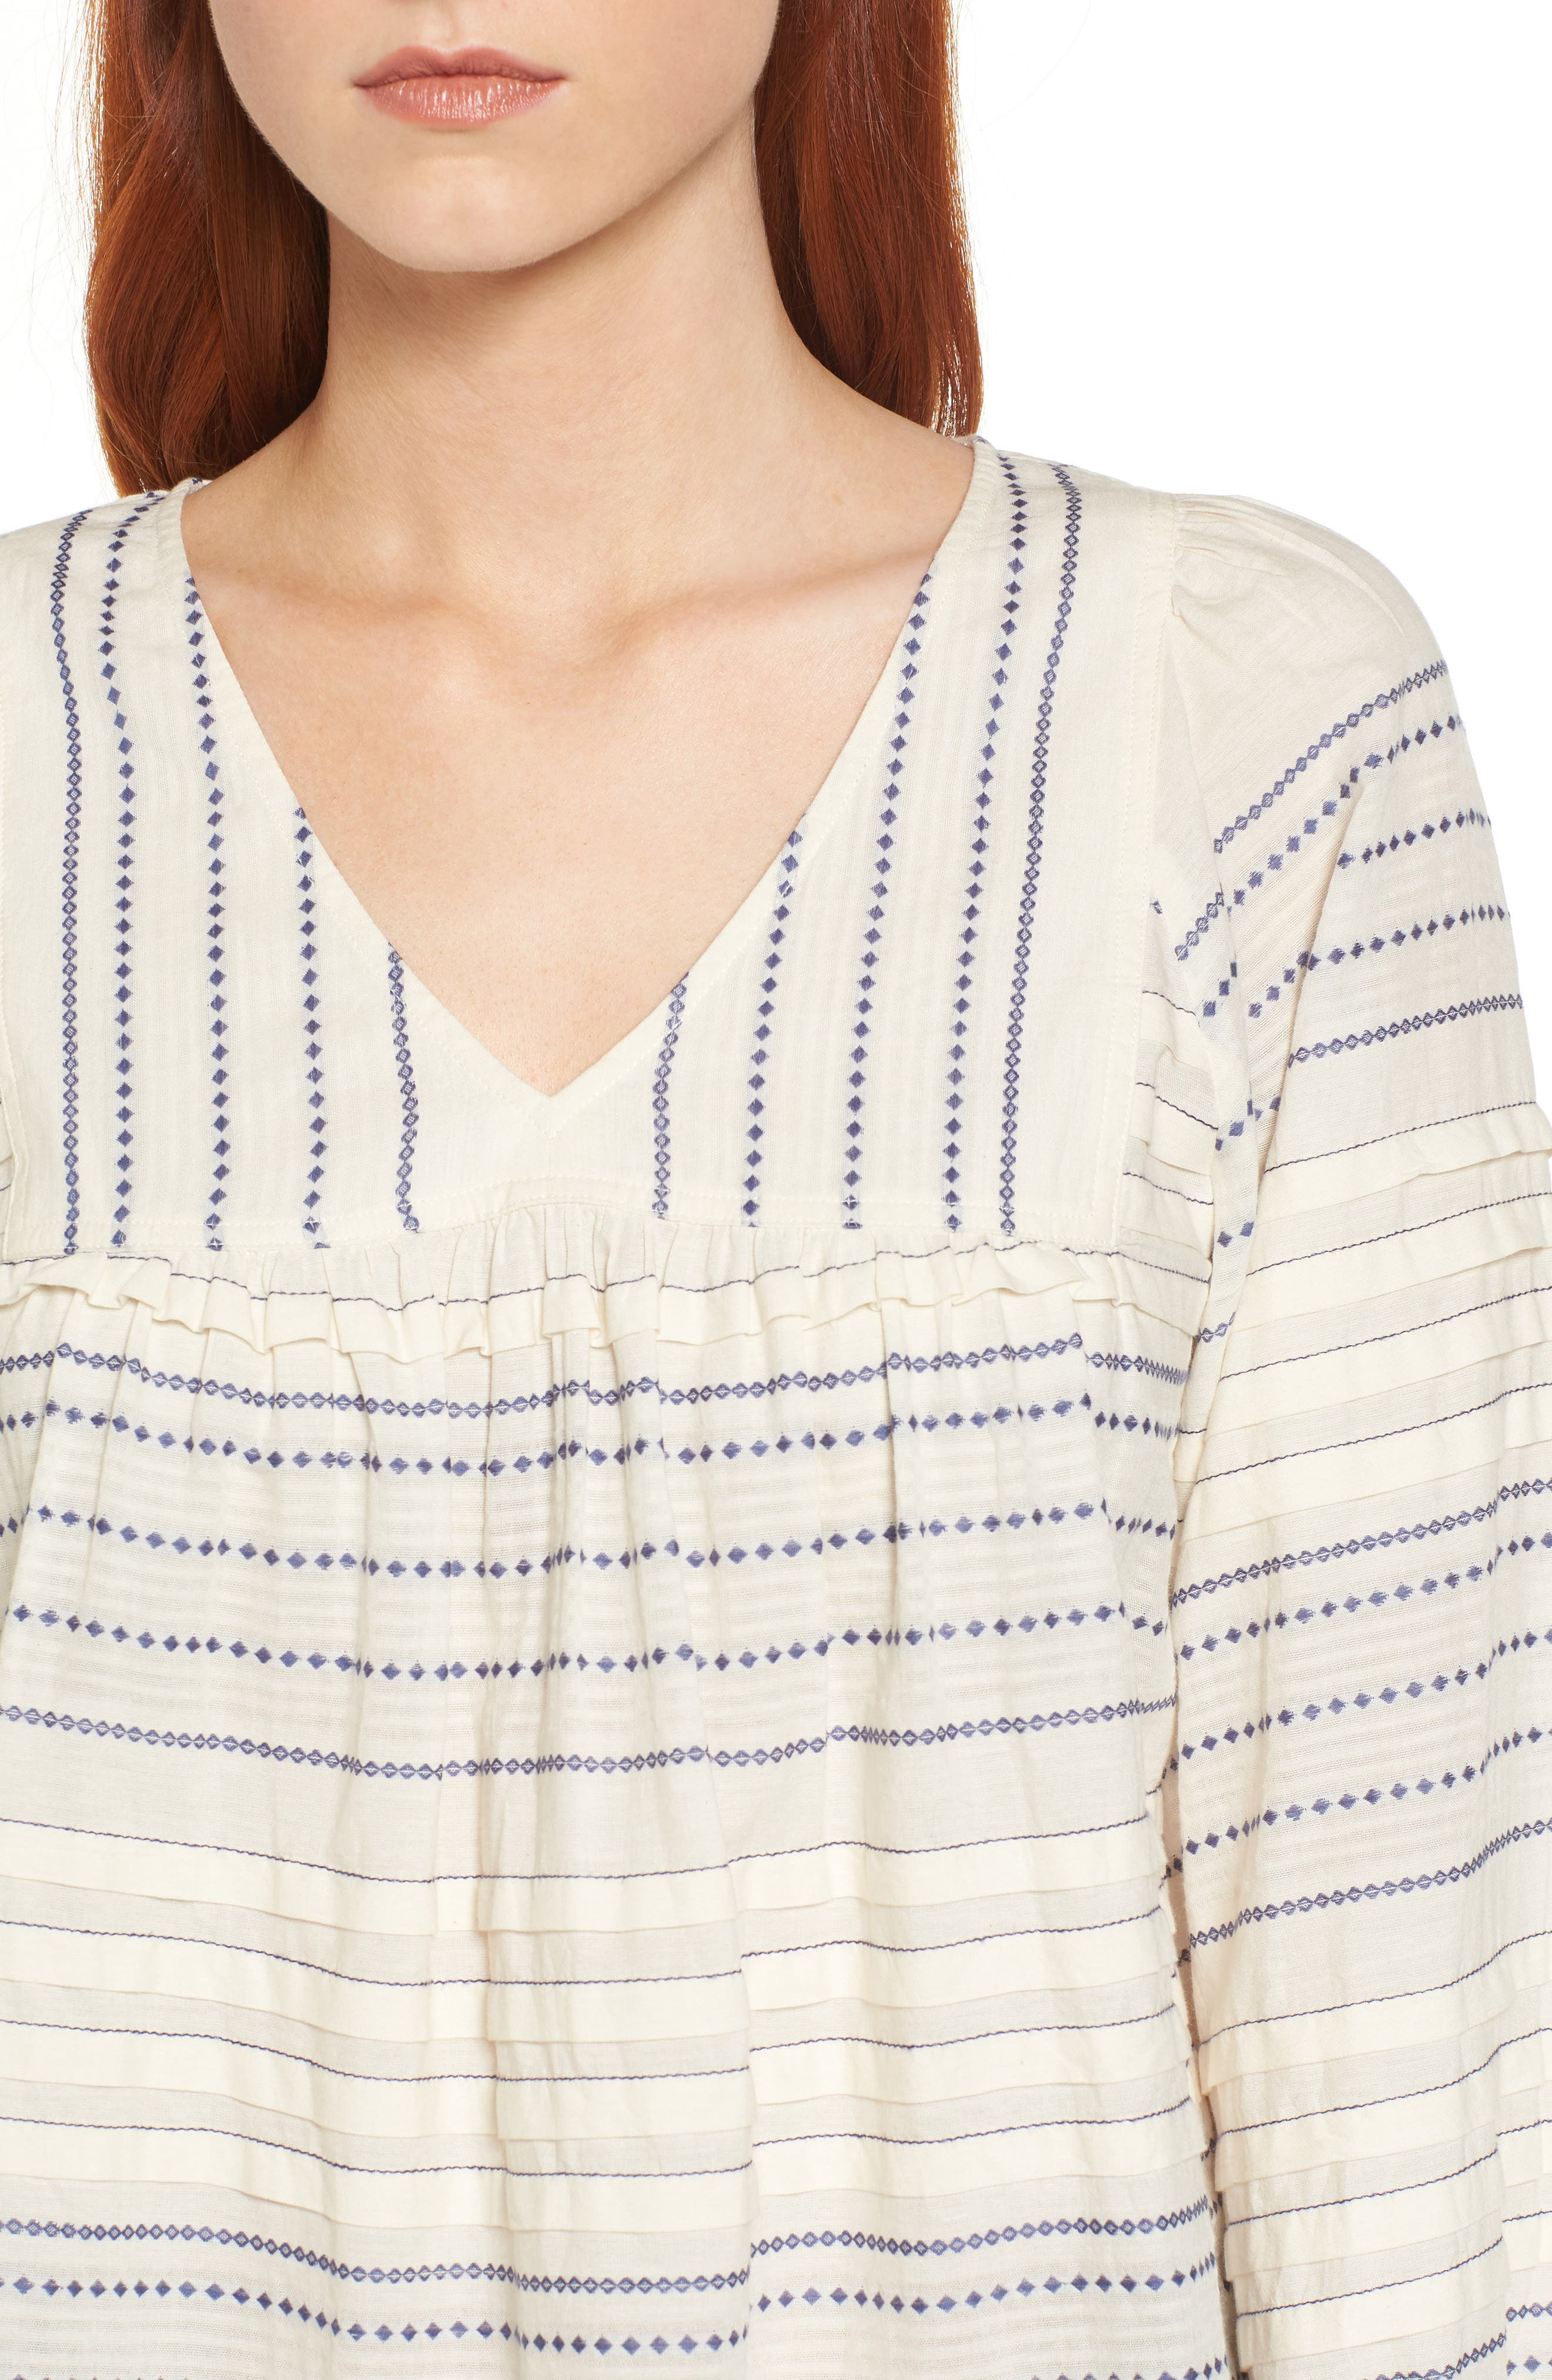 Paros Embroidered Cotton Peasant Blouse,                             Alternate thumbnail 4, color,                             906